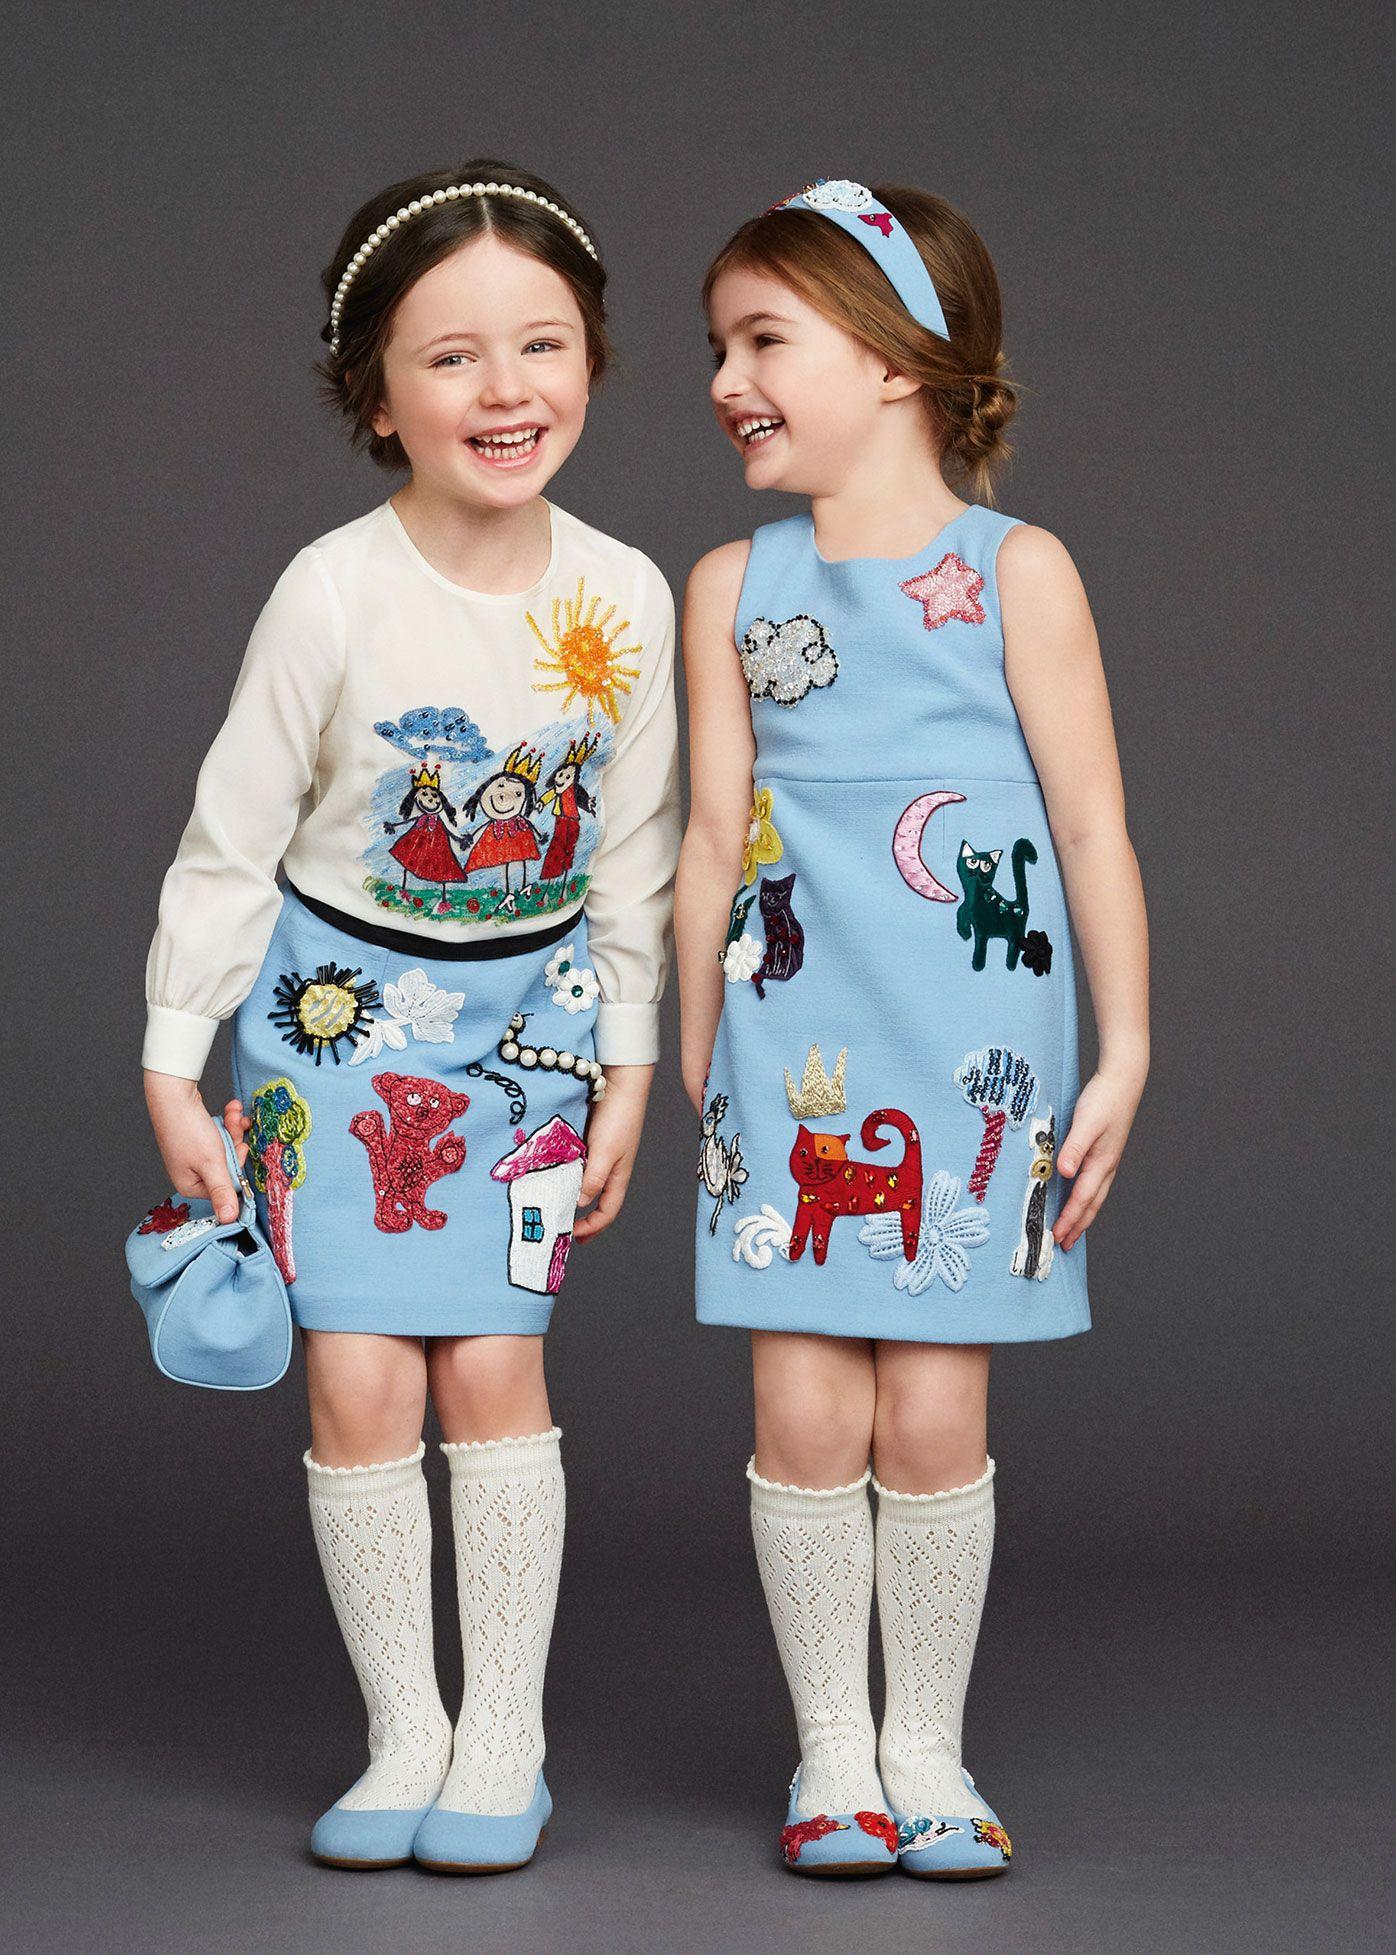 adb2ab482 Dolce&Gabbana Kids: New Collection FW15/16 | kids contemporary ...